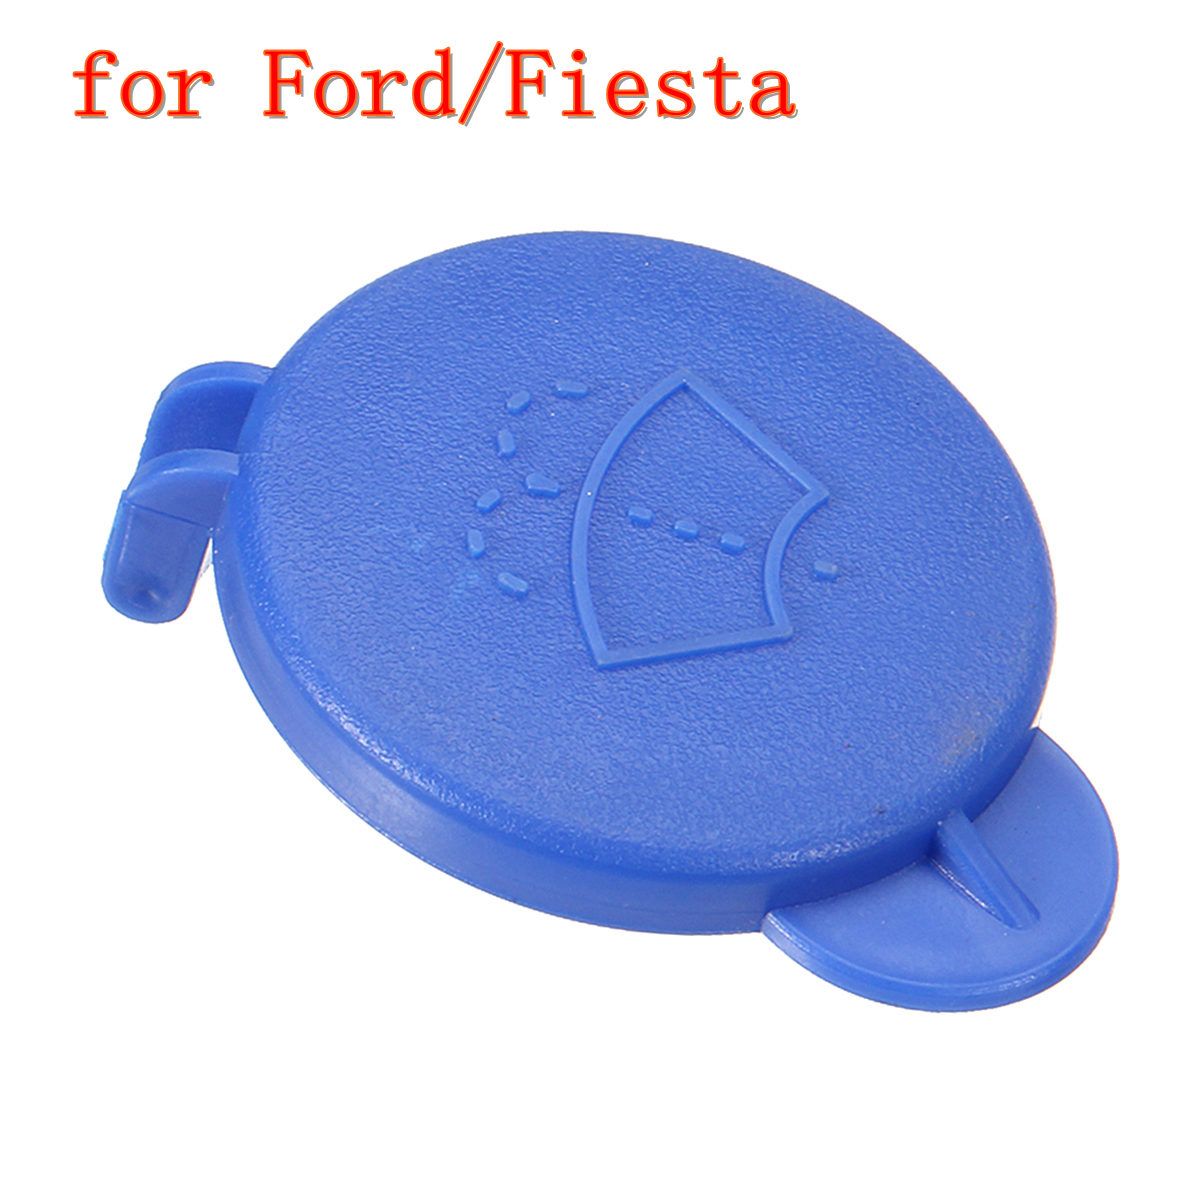 Стеклоомывателя бутылки Кепки для Ford Fiesta MK6 2001-2008 синий 1488251 2s61 17632ad ...